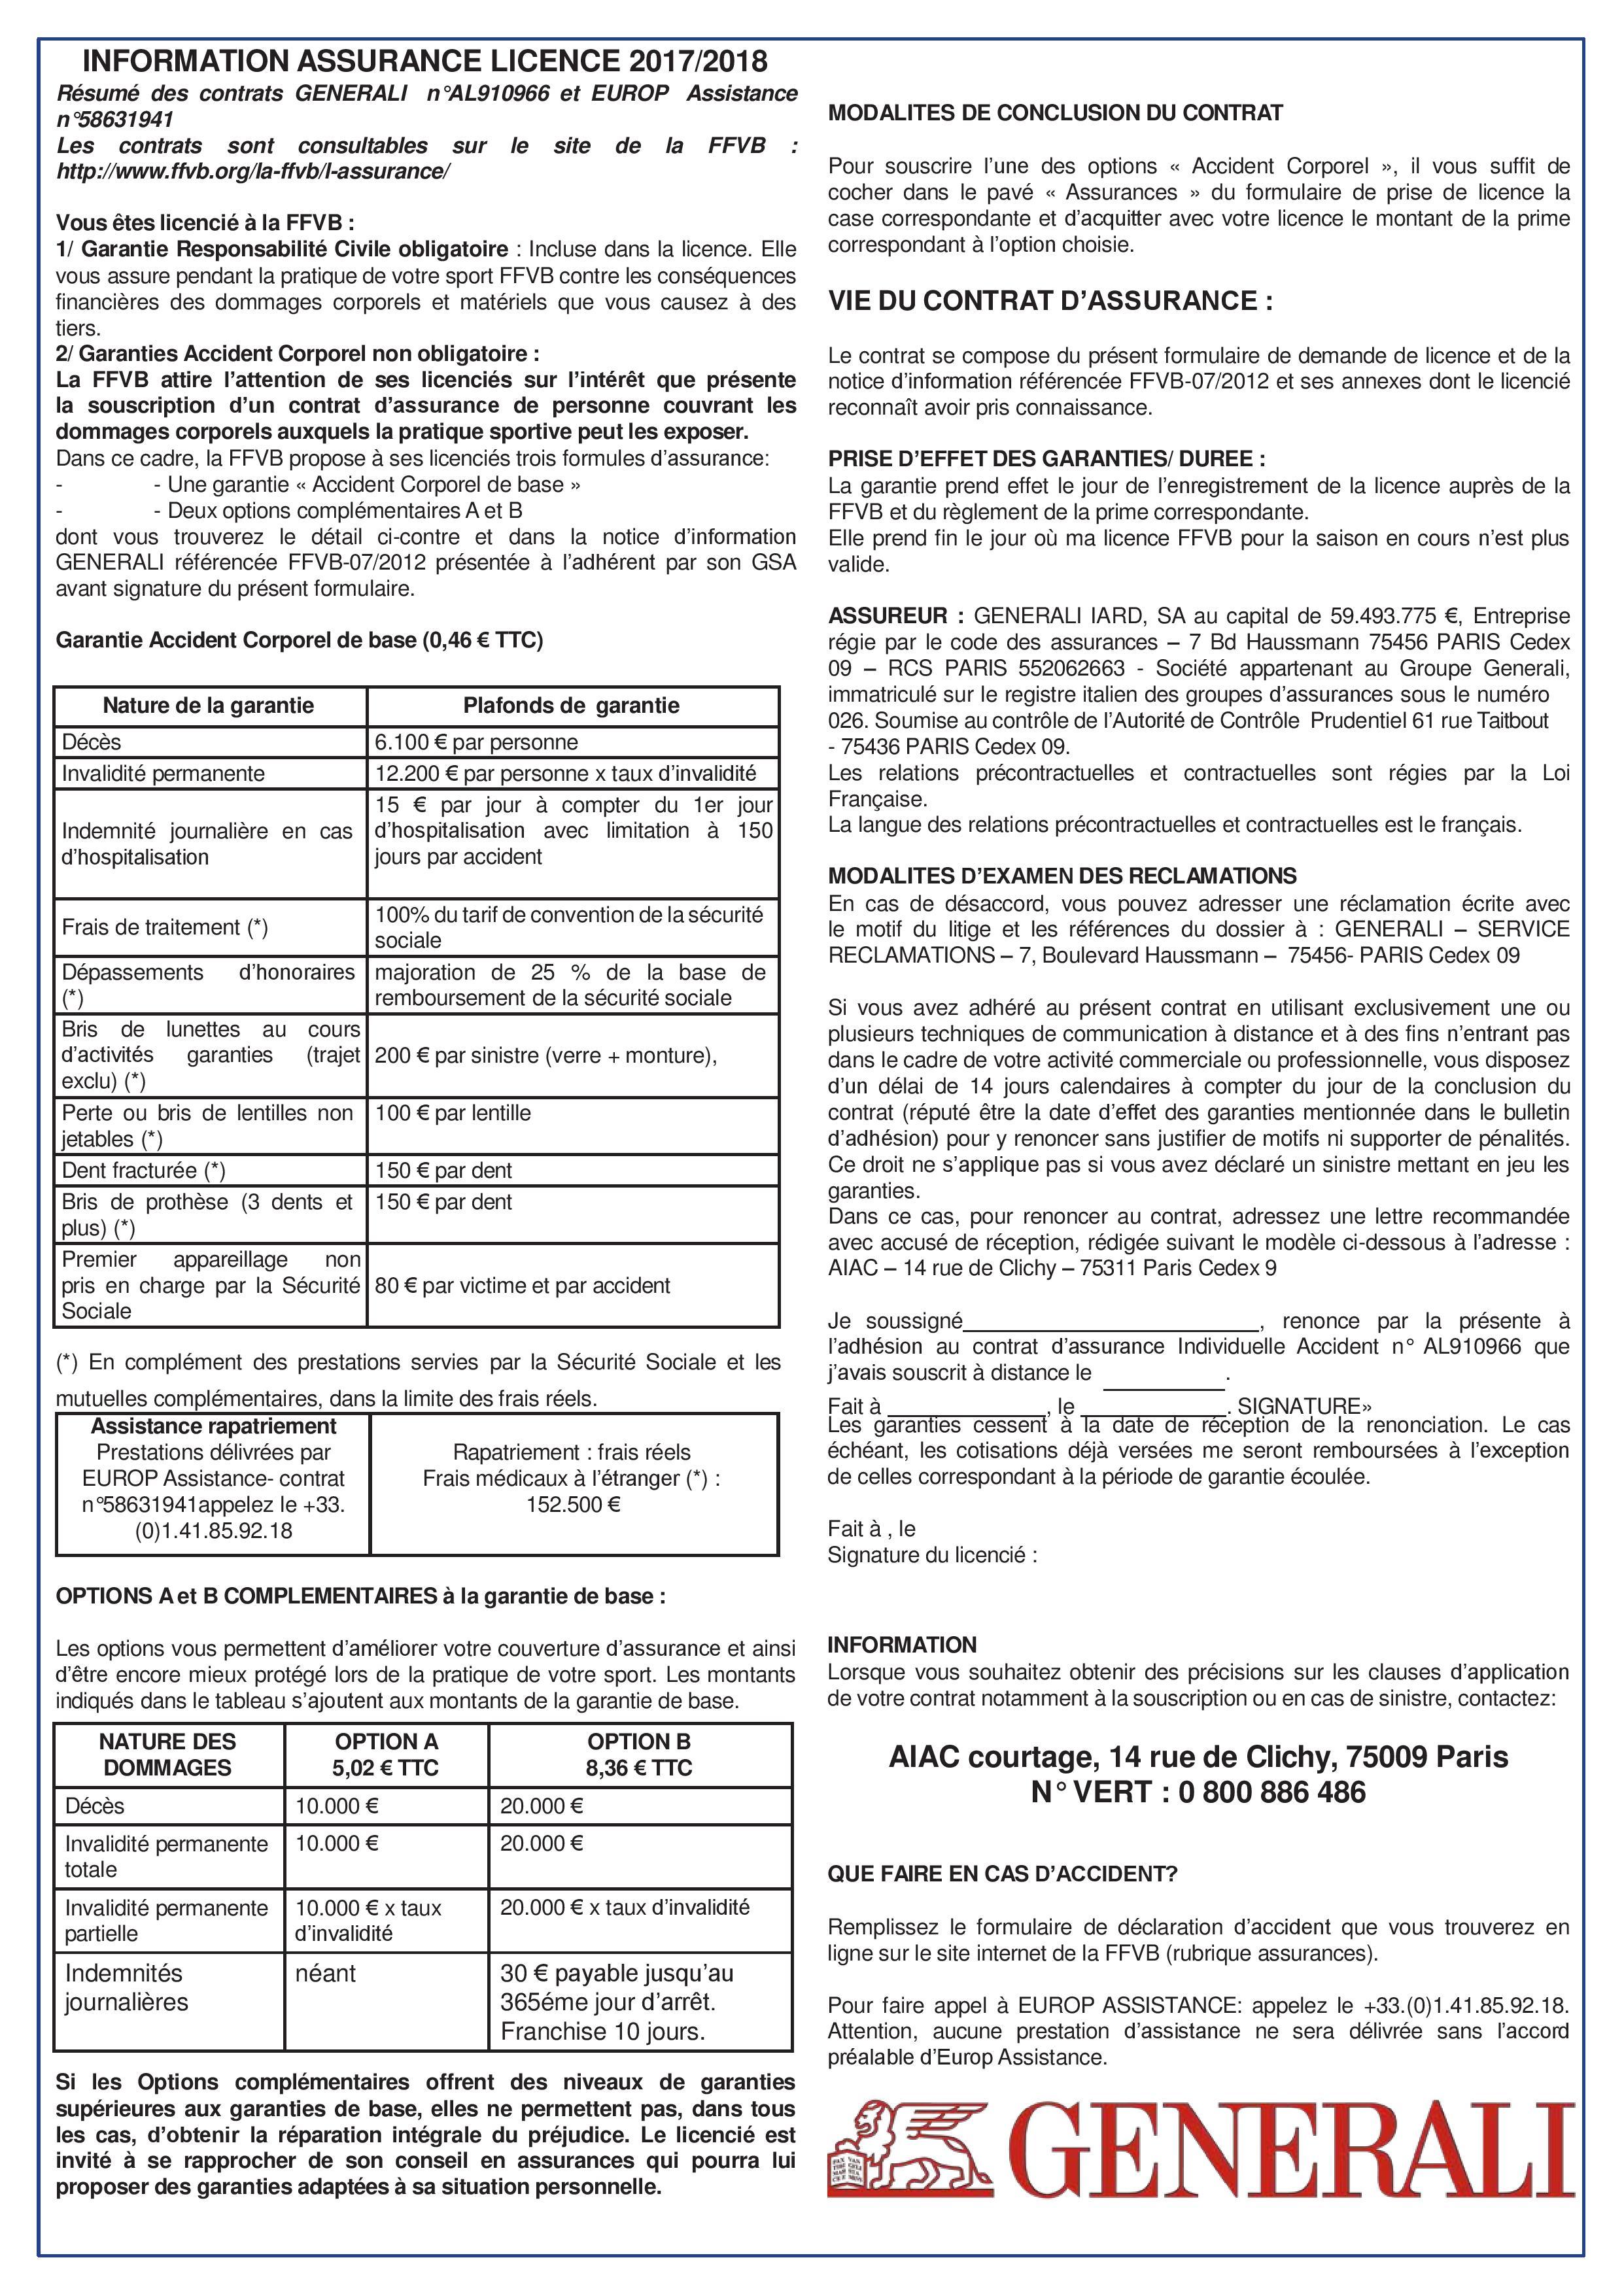 Formulaire demande licences 2017_2018 (2)